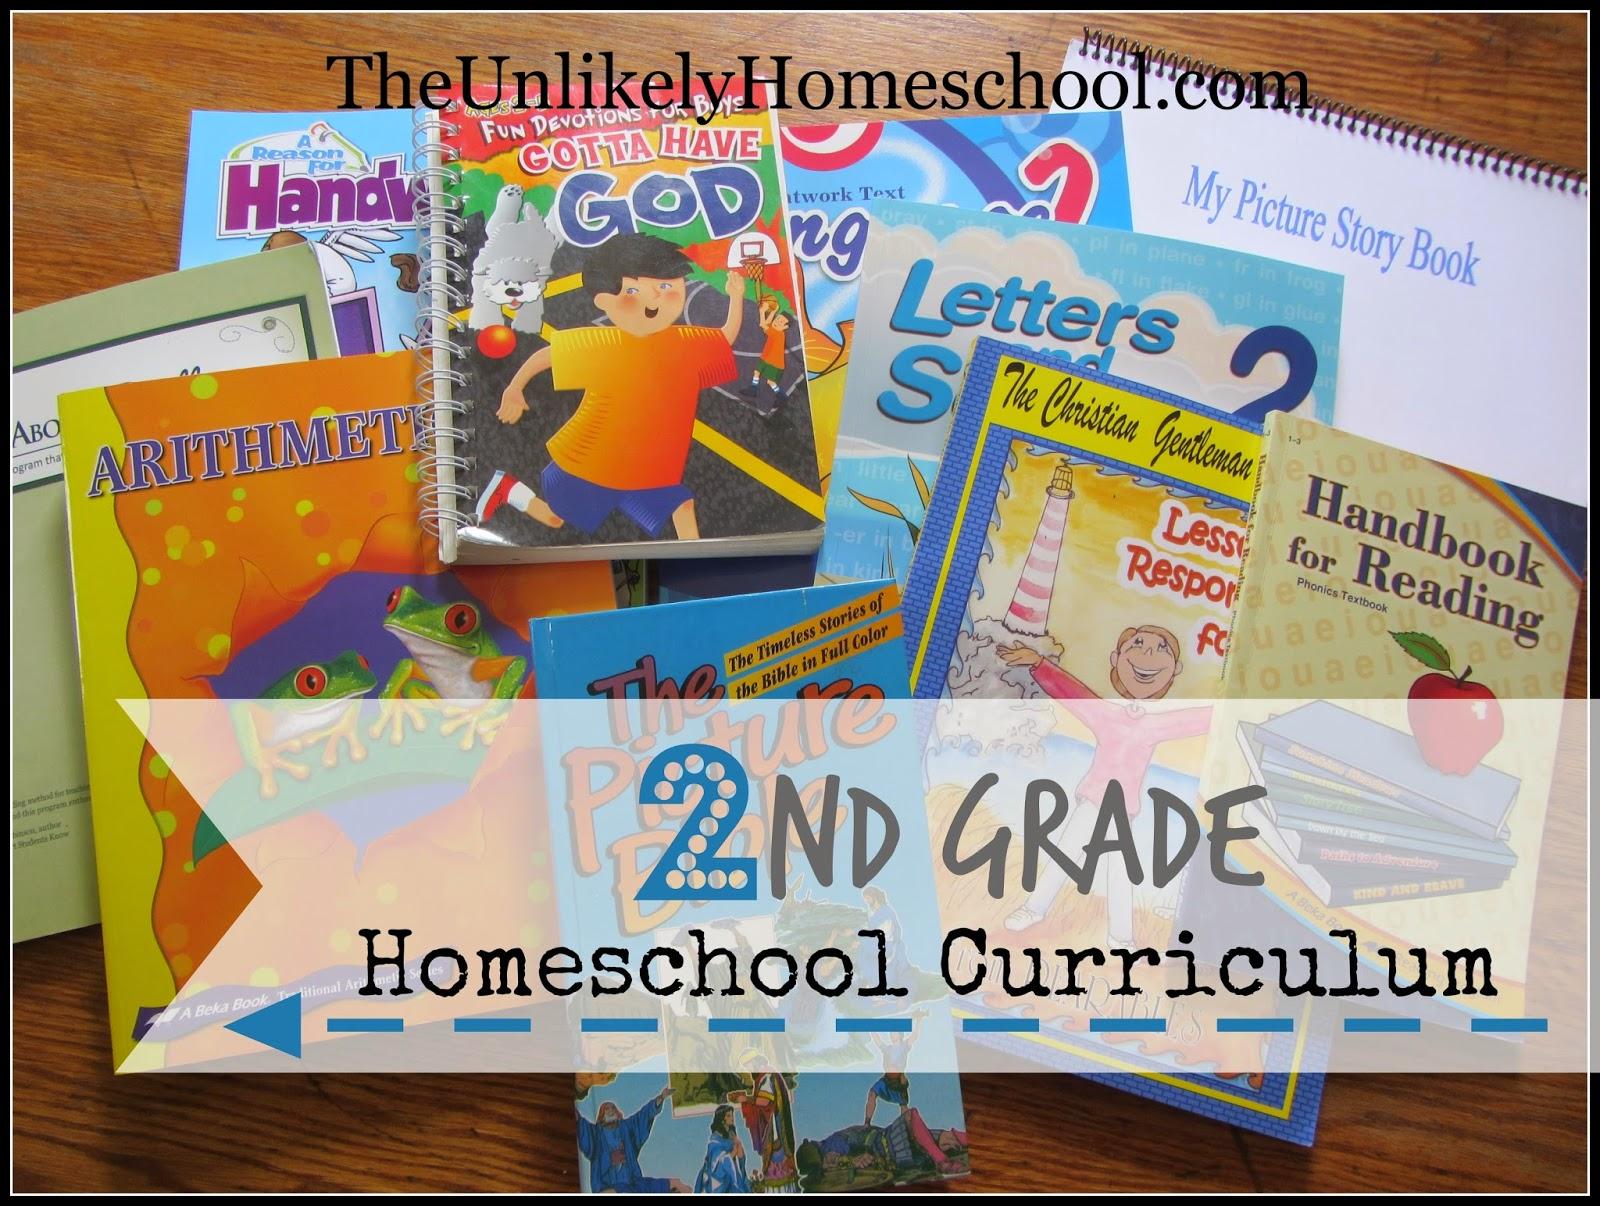 The Unlikely Homeschool 2nd Grade Homeschool Curriculum